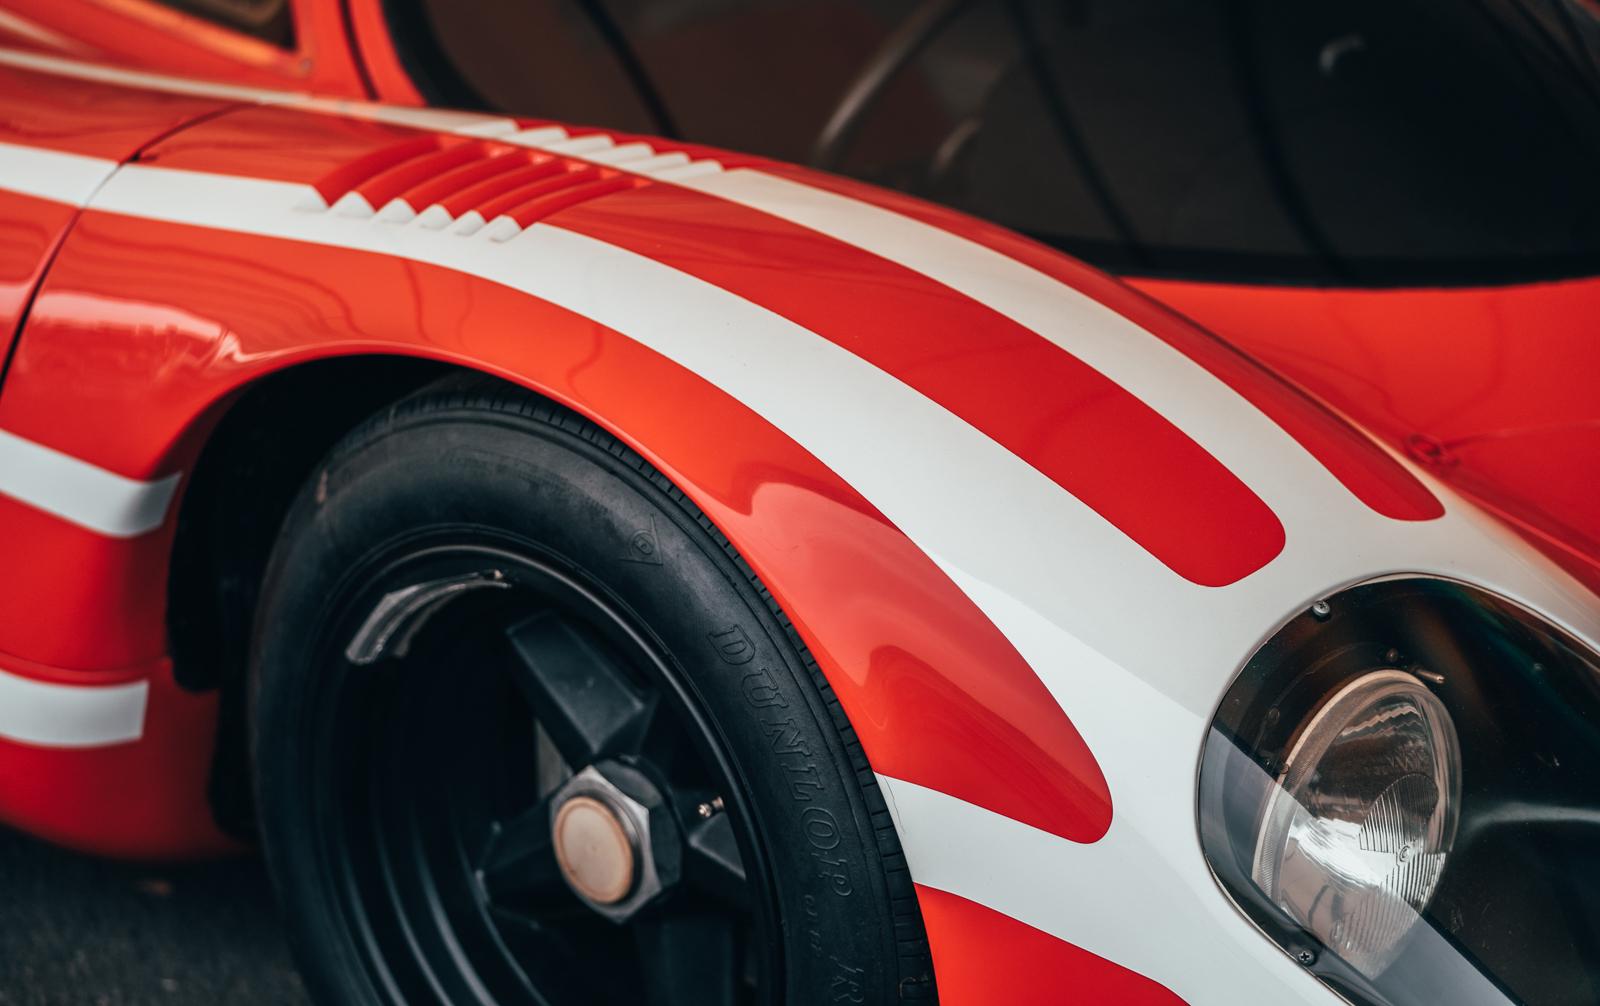 RP - Porsche Goodwood Fesitval of Speed 70 Years 2018-44.jpg